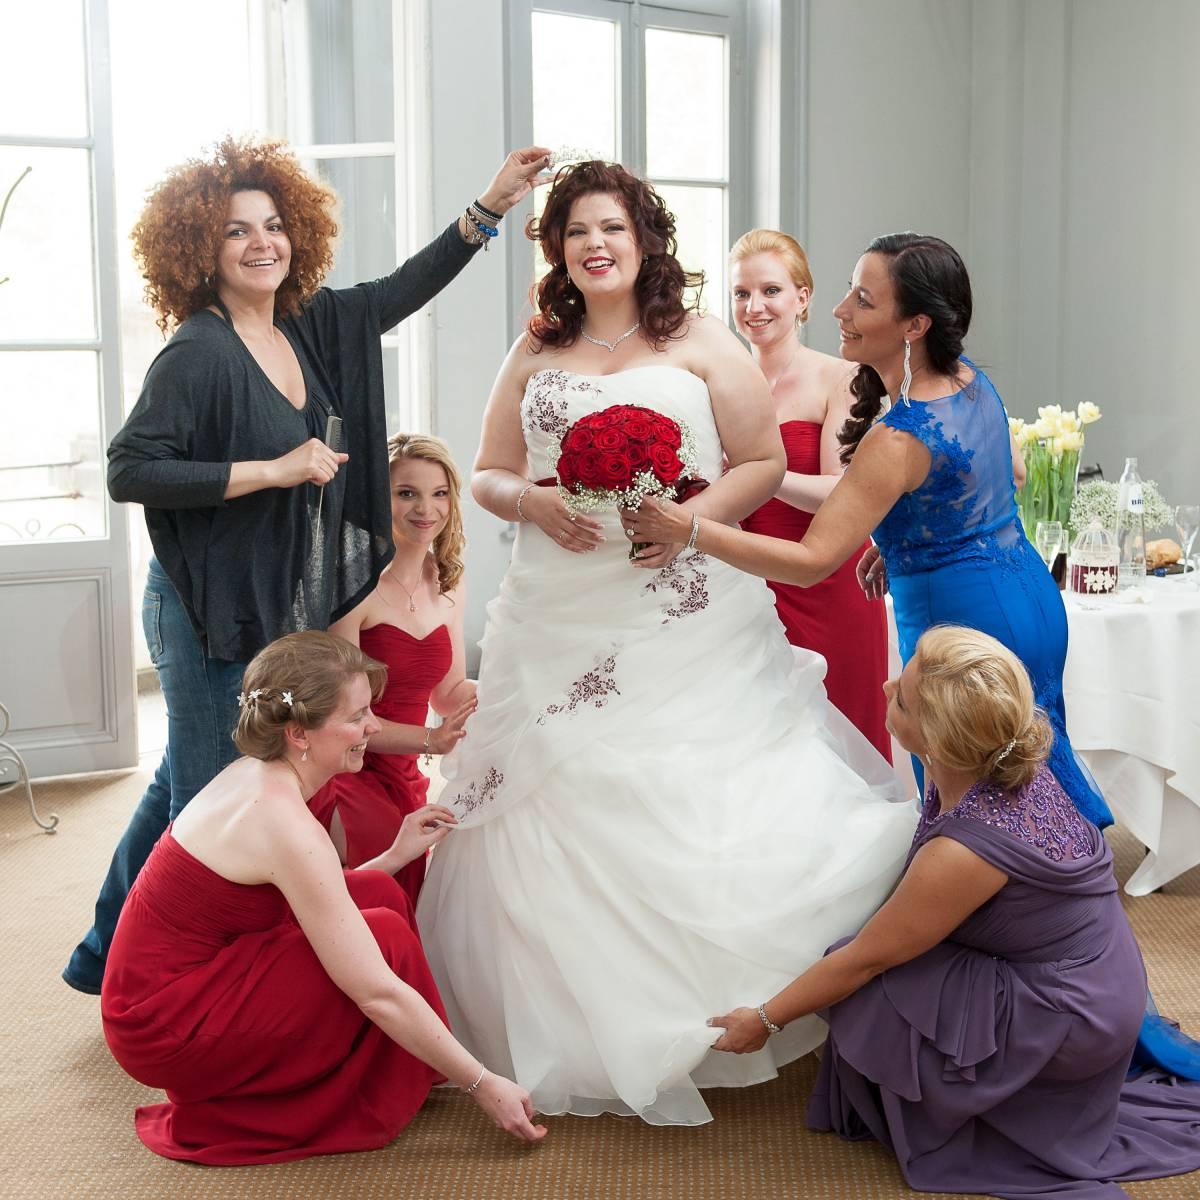 Foto Meeuw - House of Weddings - 17